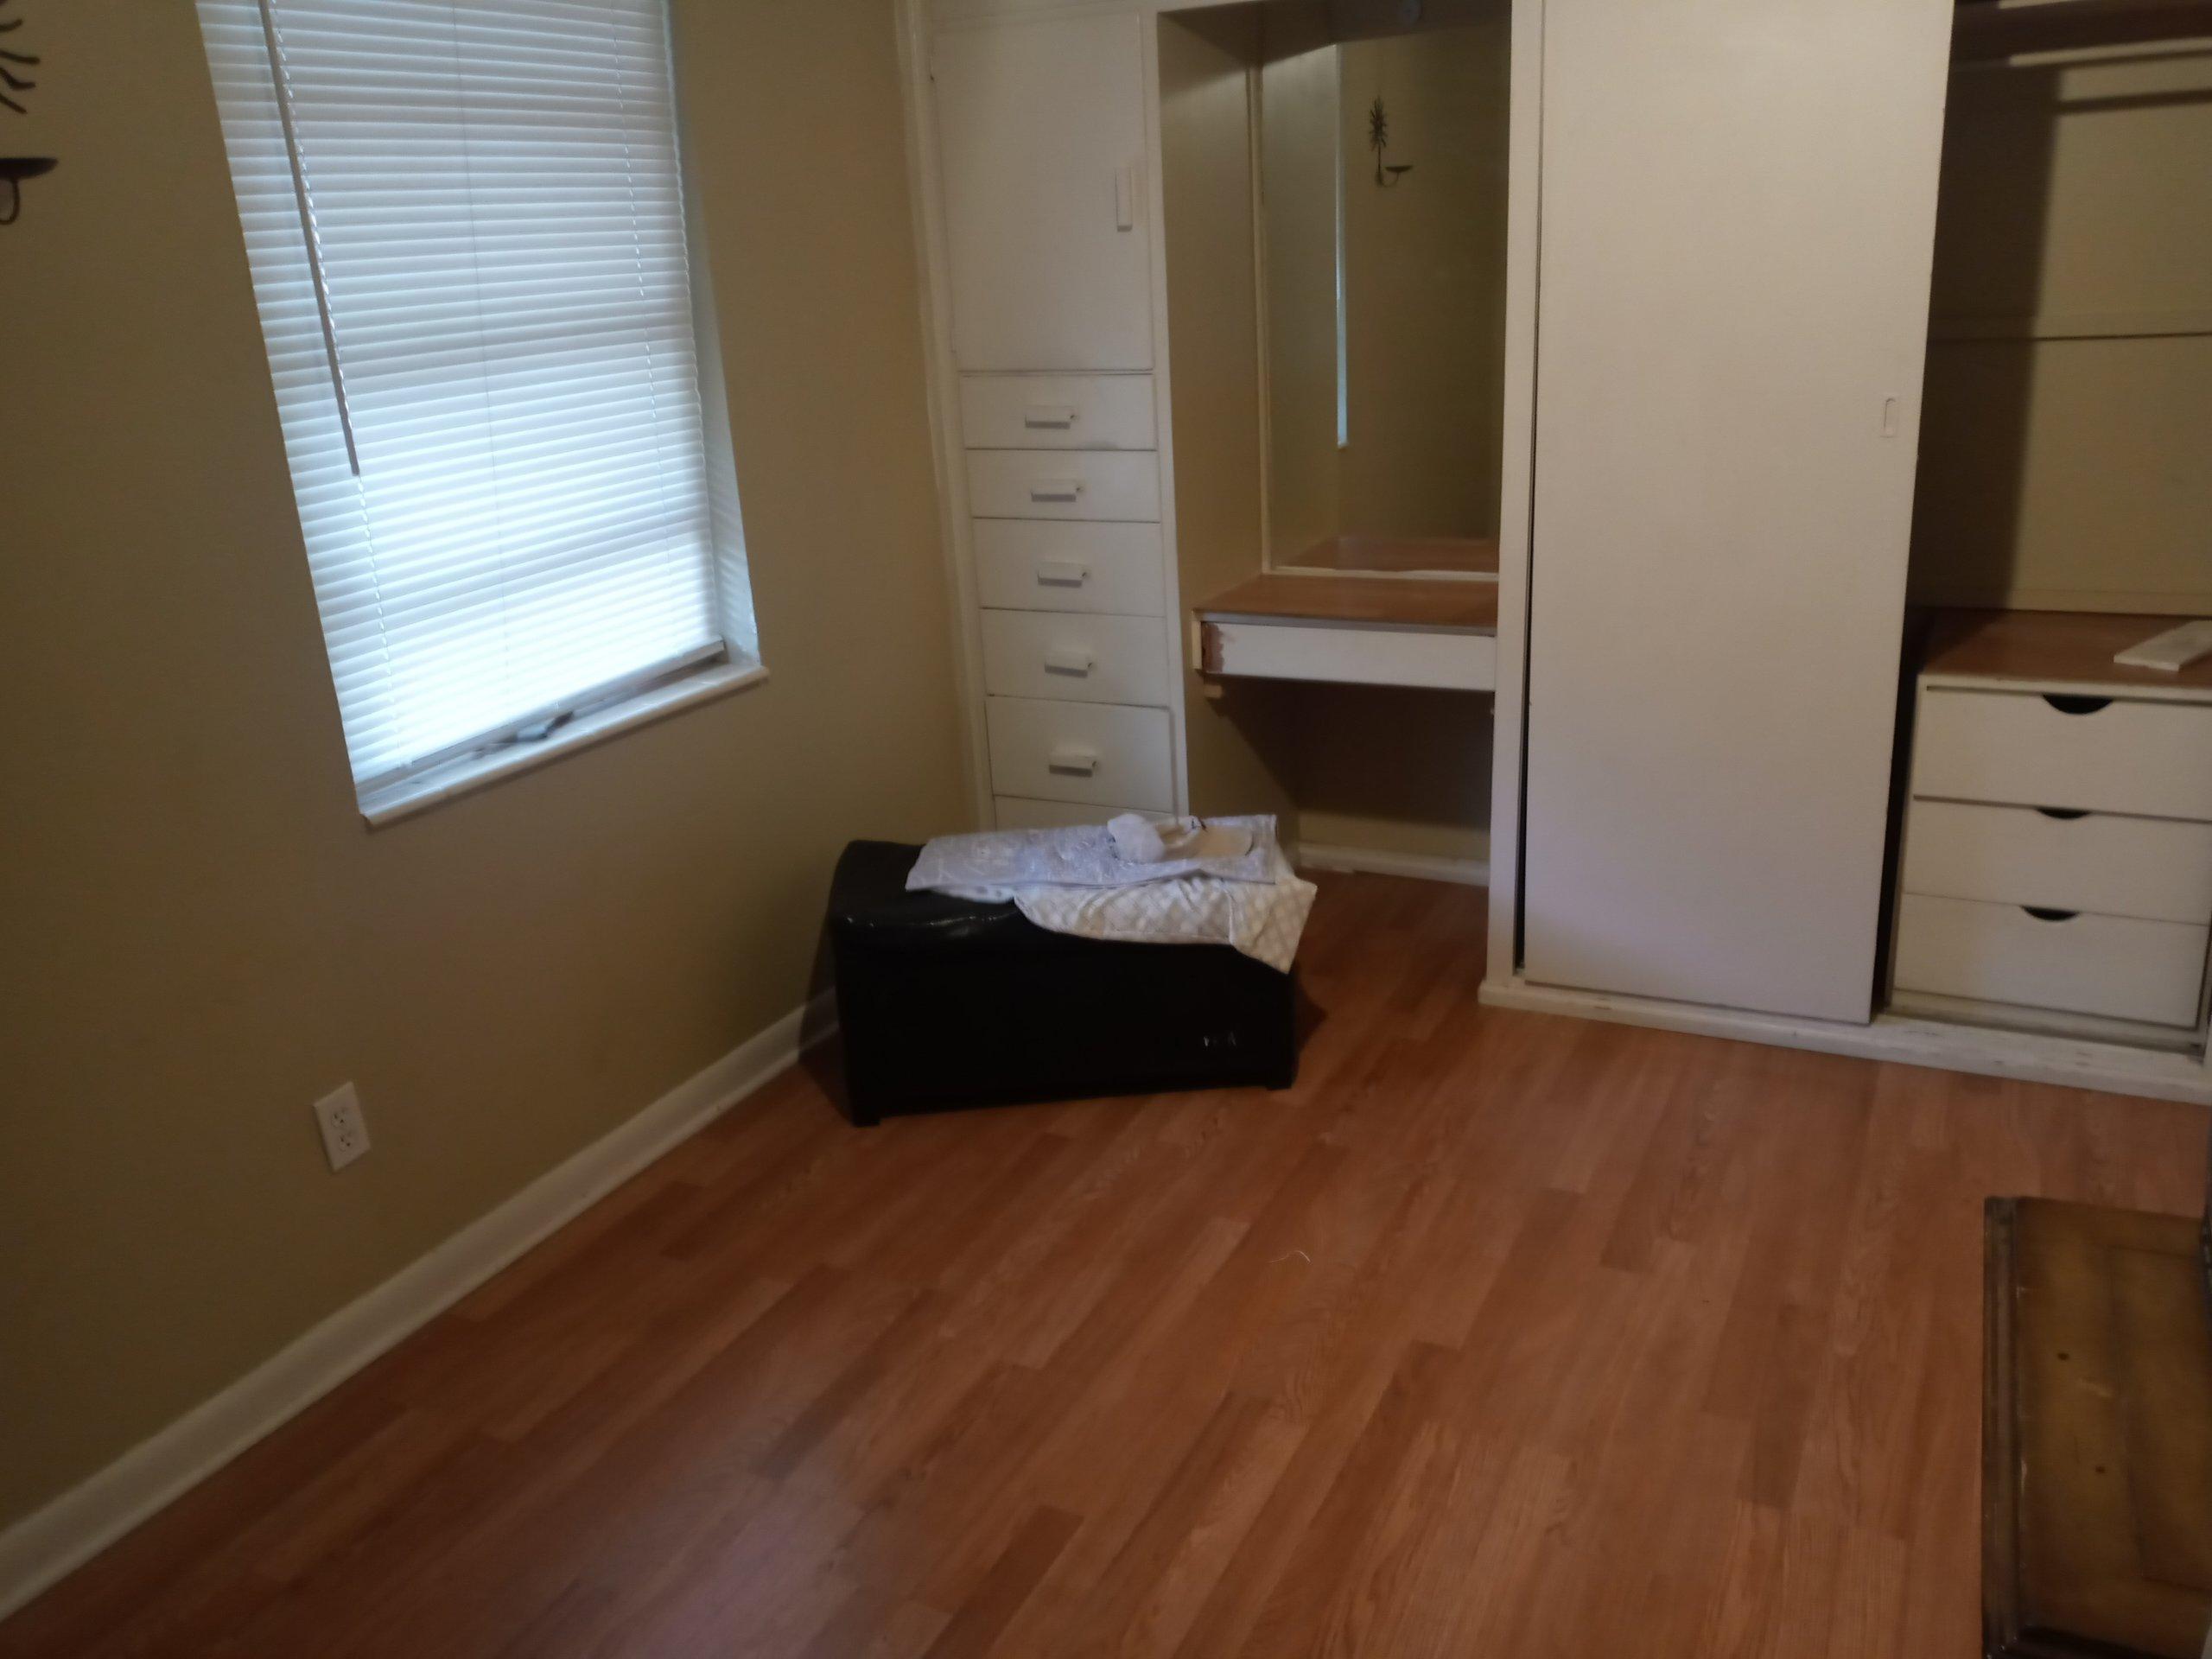 8x12 Bedroom self storage unit